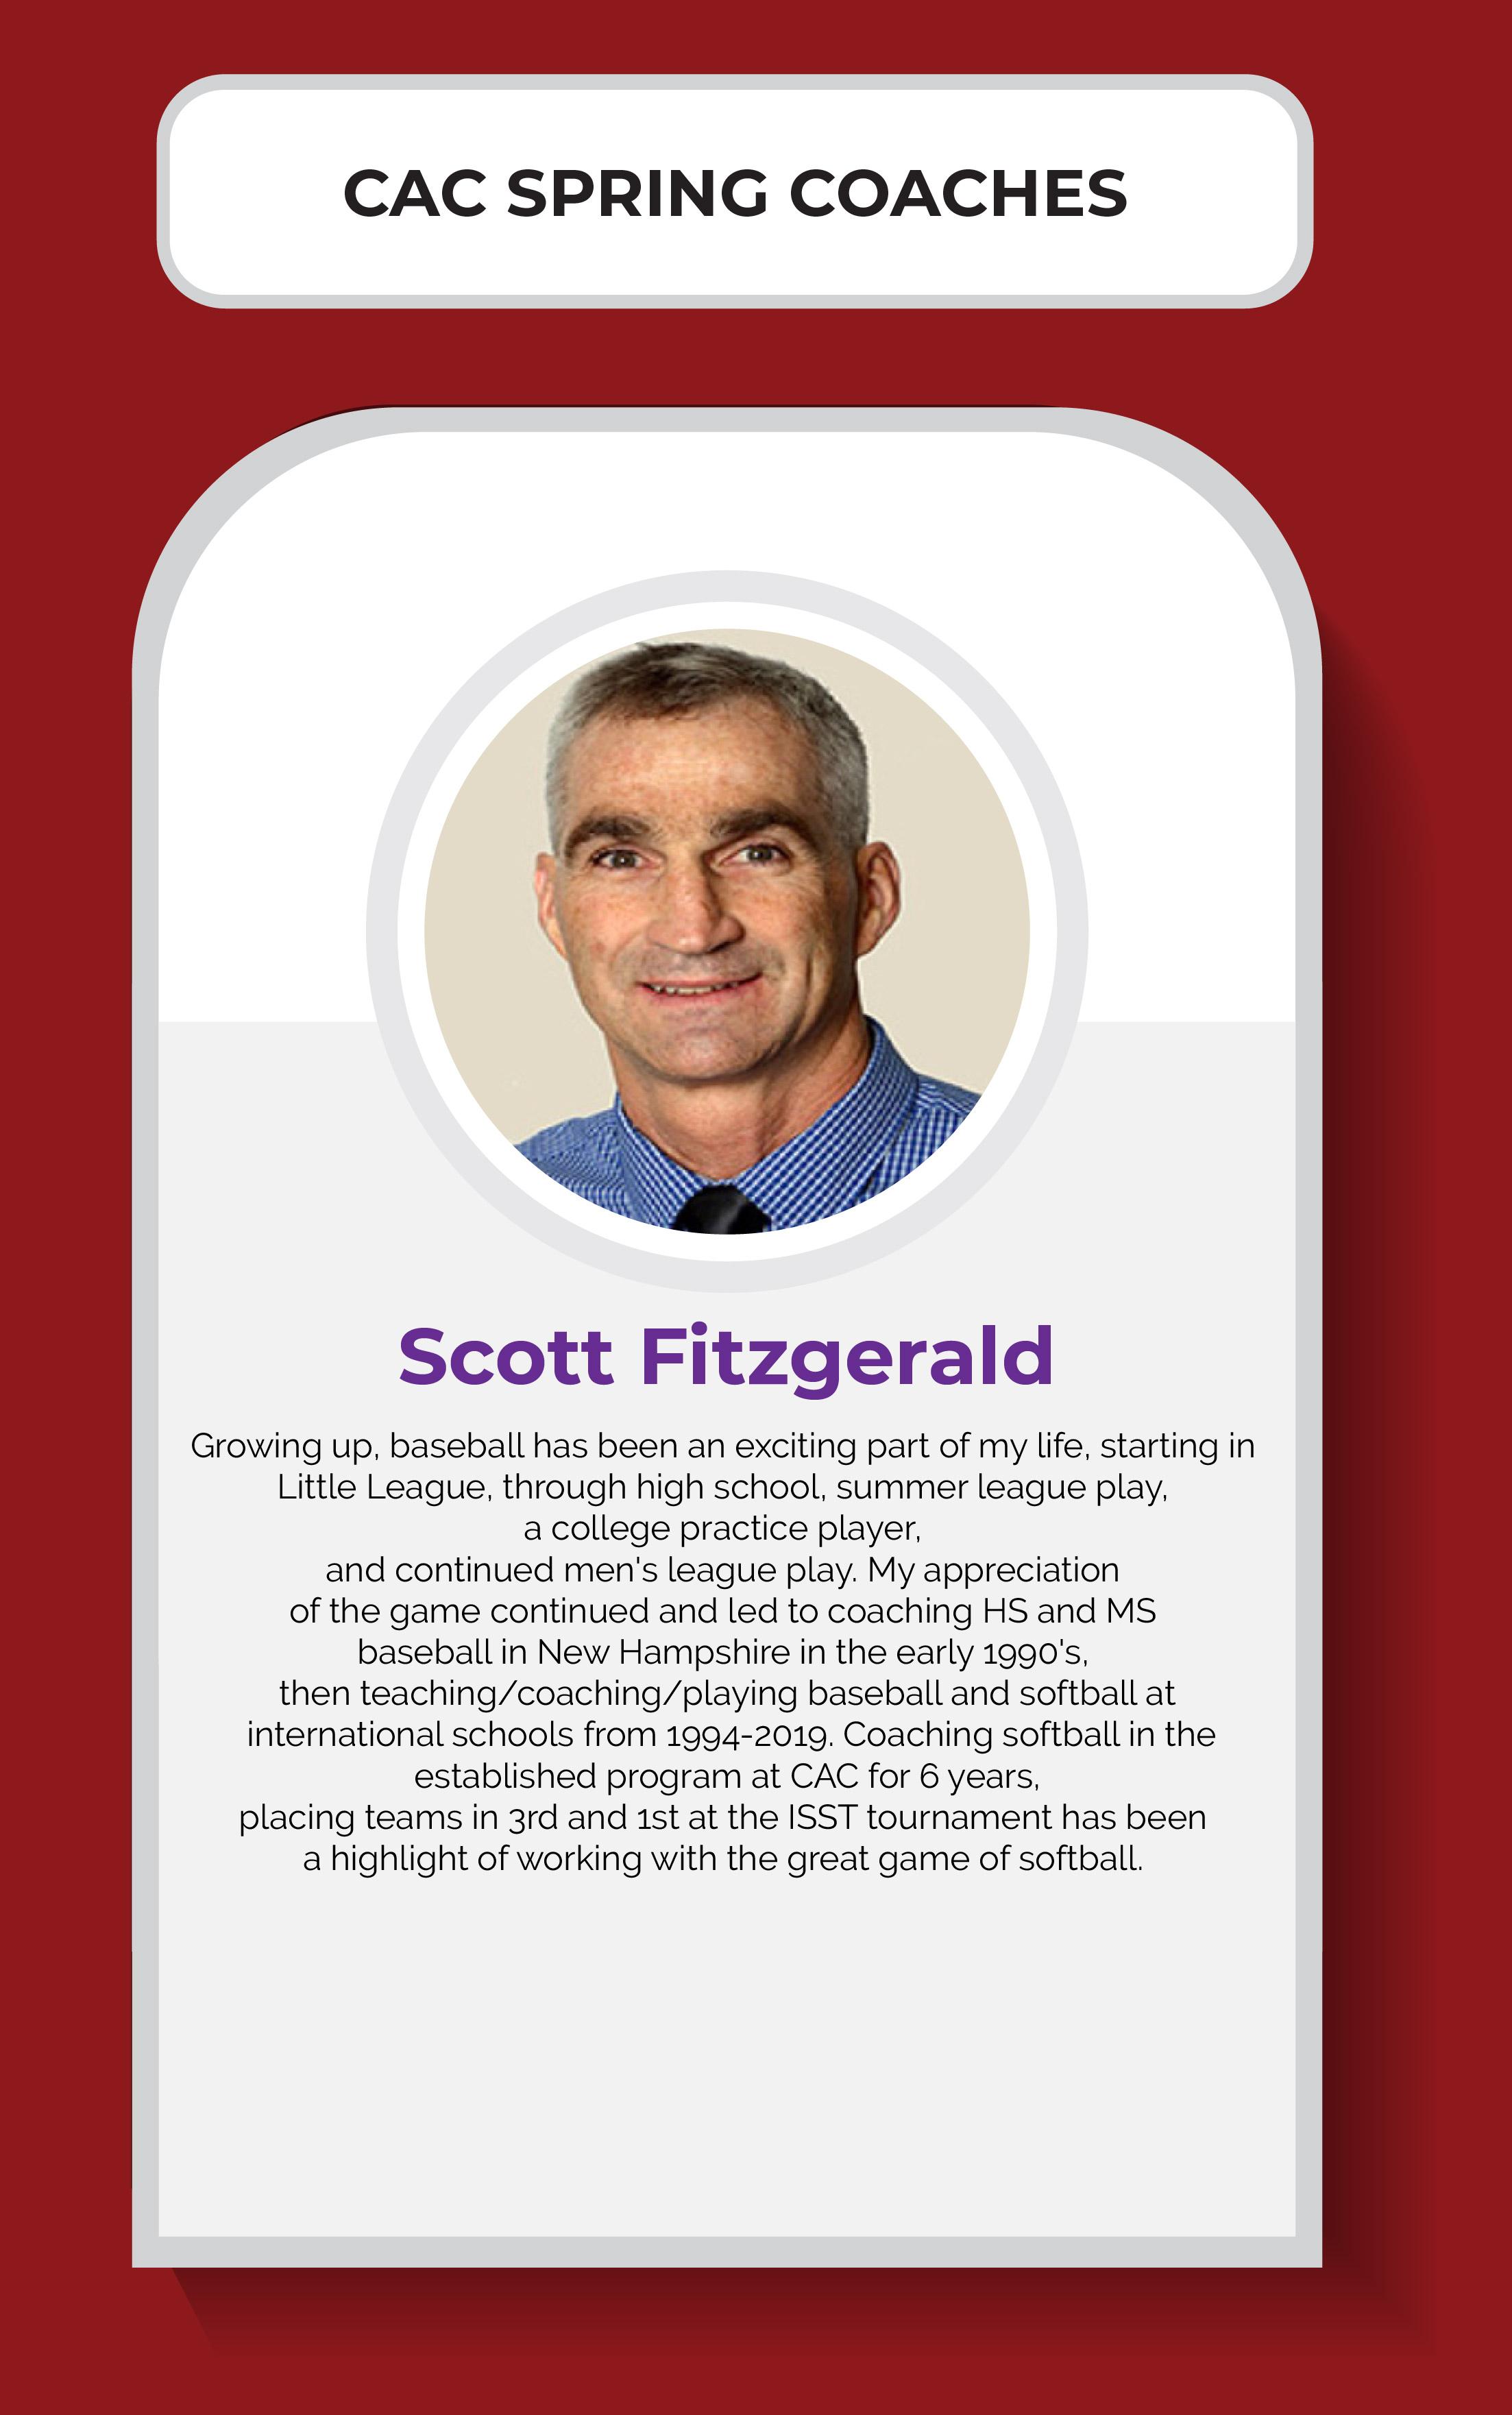 ScottFitzgerald-01